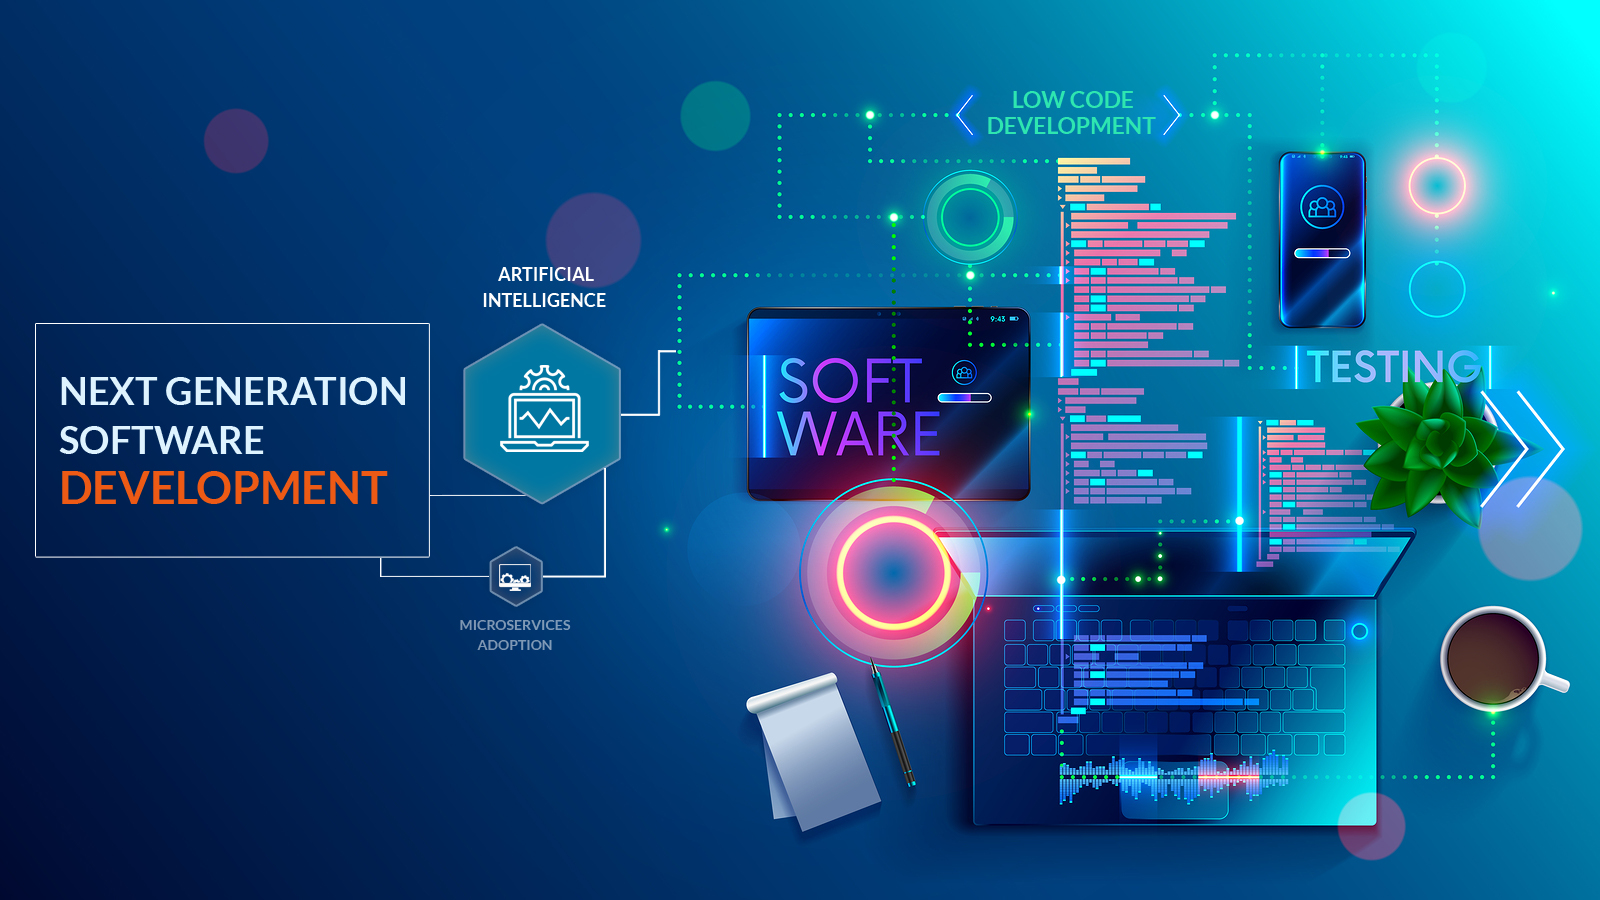 Next Generation Software Development